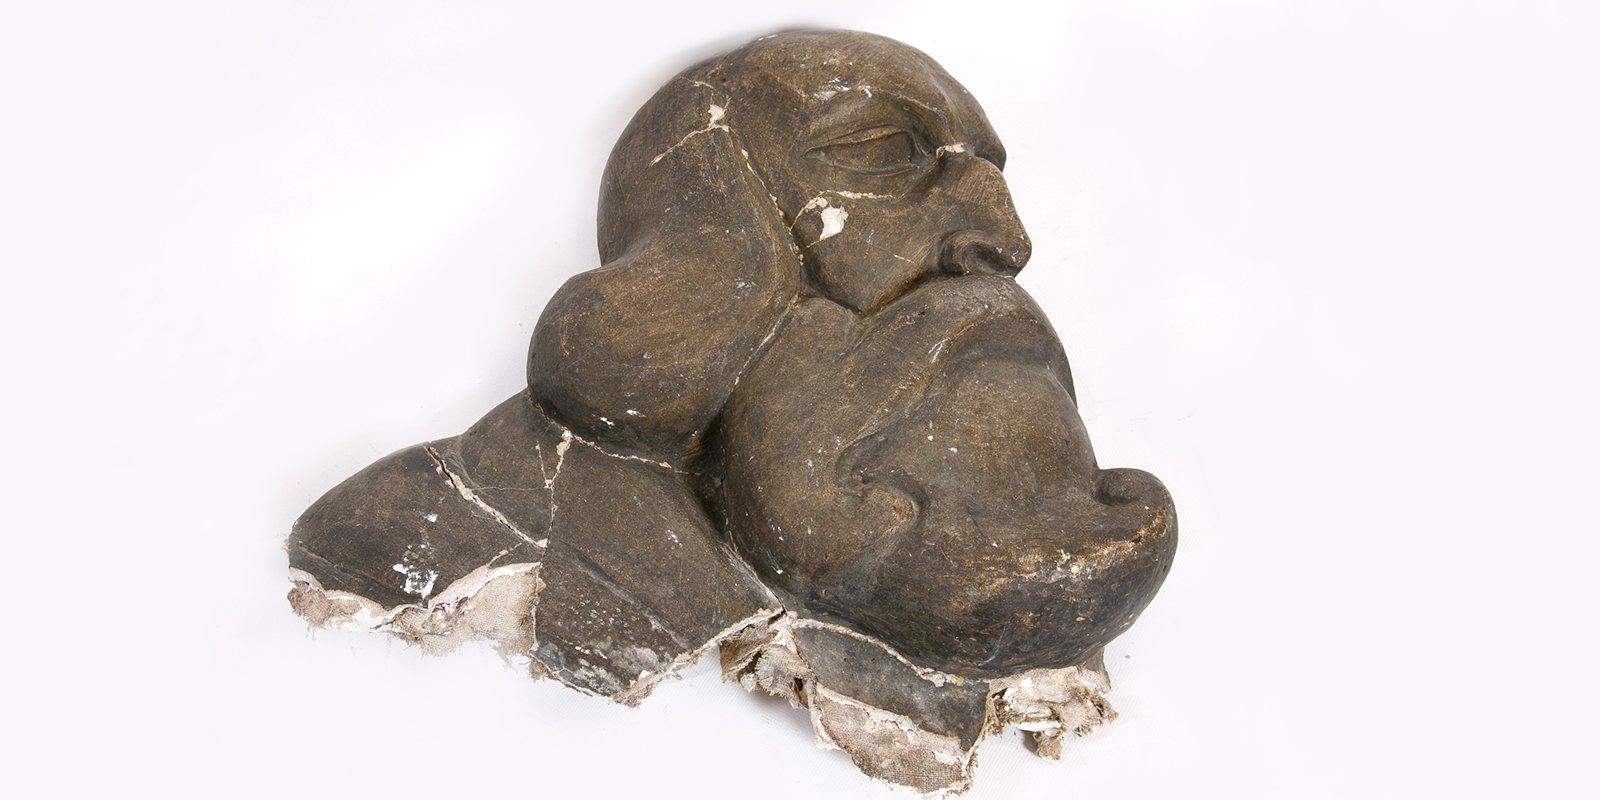 Vasily Vatagin. Andrei Rublev's Head